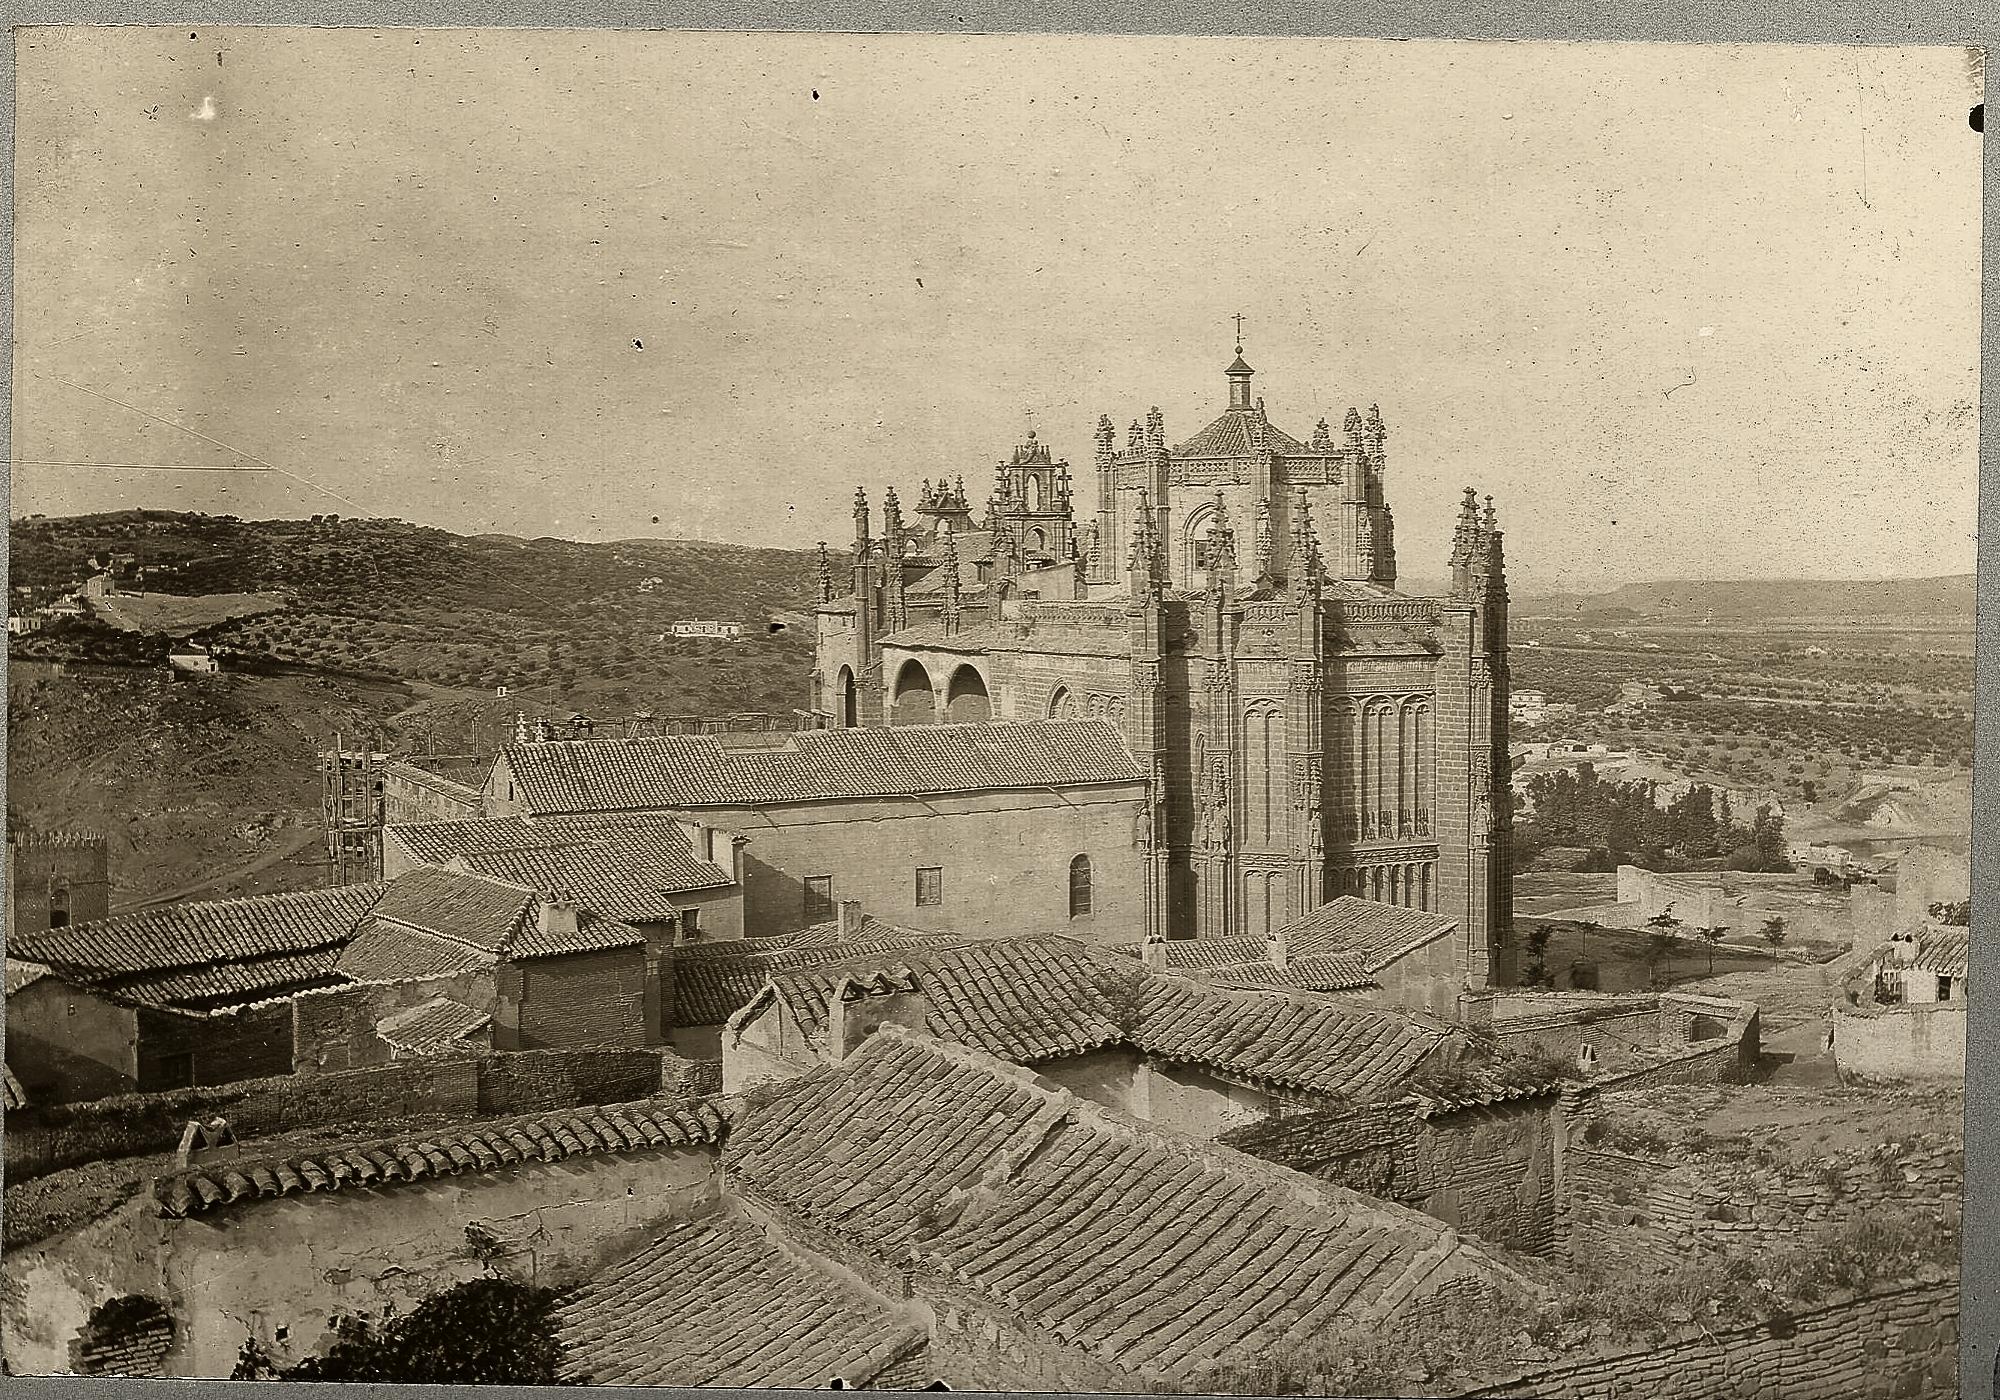 Monasterio de San Juan de los Reyes en 1886 © Archives départementales de l'Aude